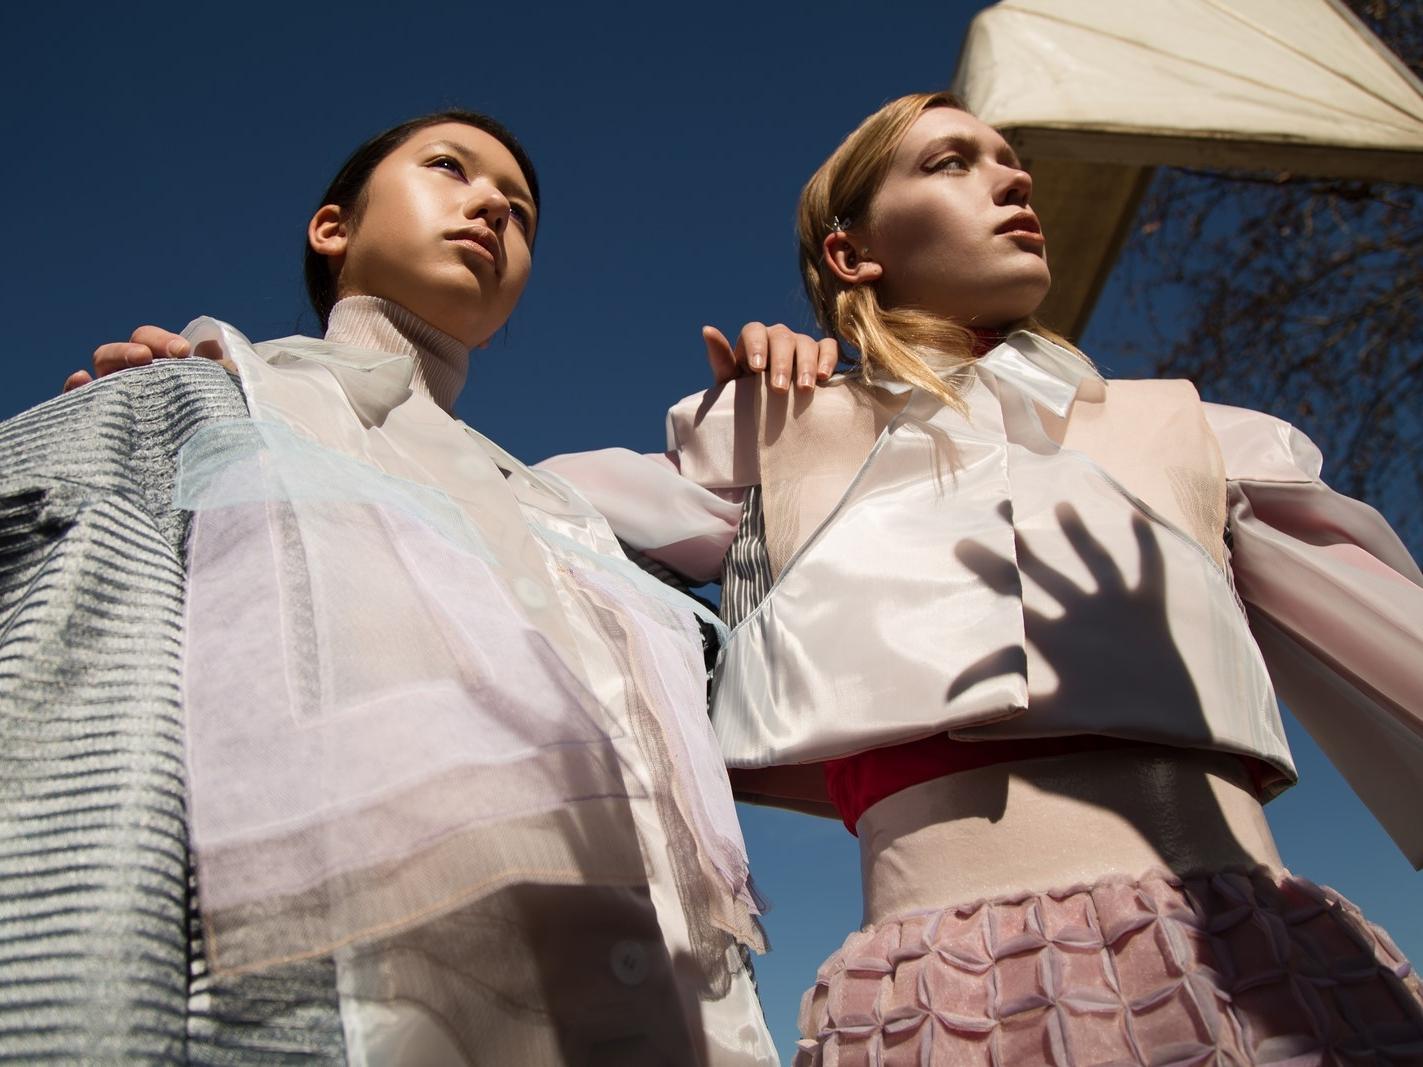 Models: Melissa Pope @themelissarae // Dylan Zoeller @dylan_zoeller Total look: Mauro Muzio Medaglia @m.m.muzio